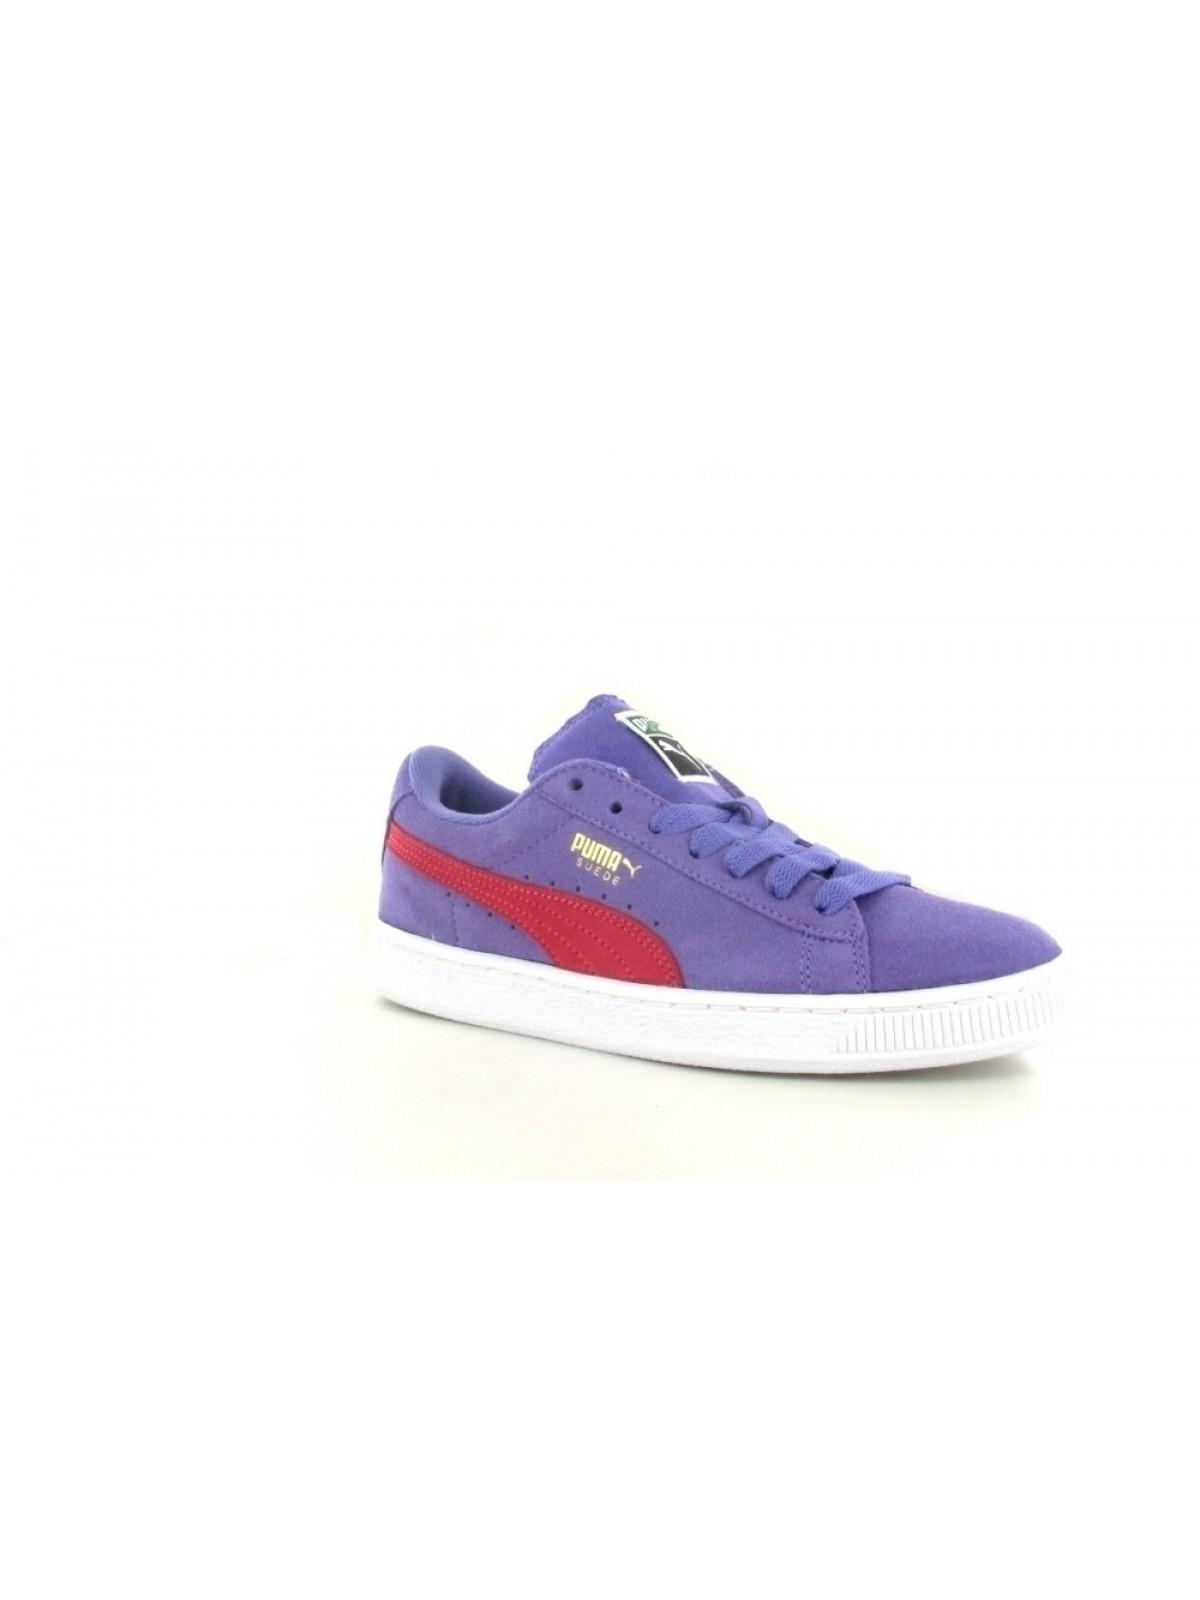 Puma suède classic ado purple